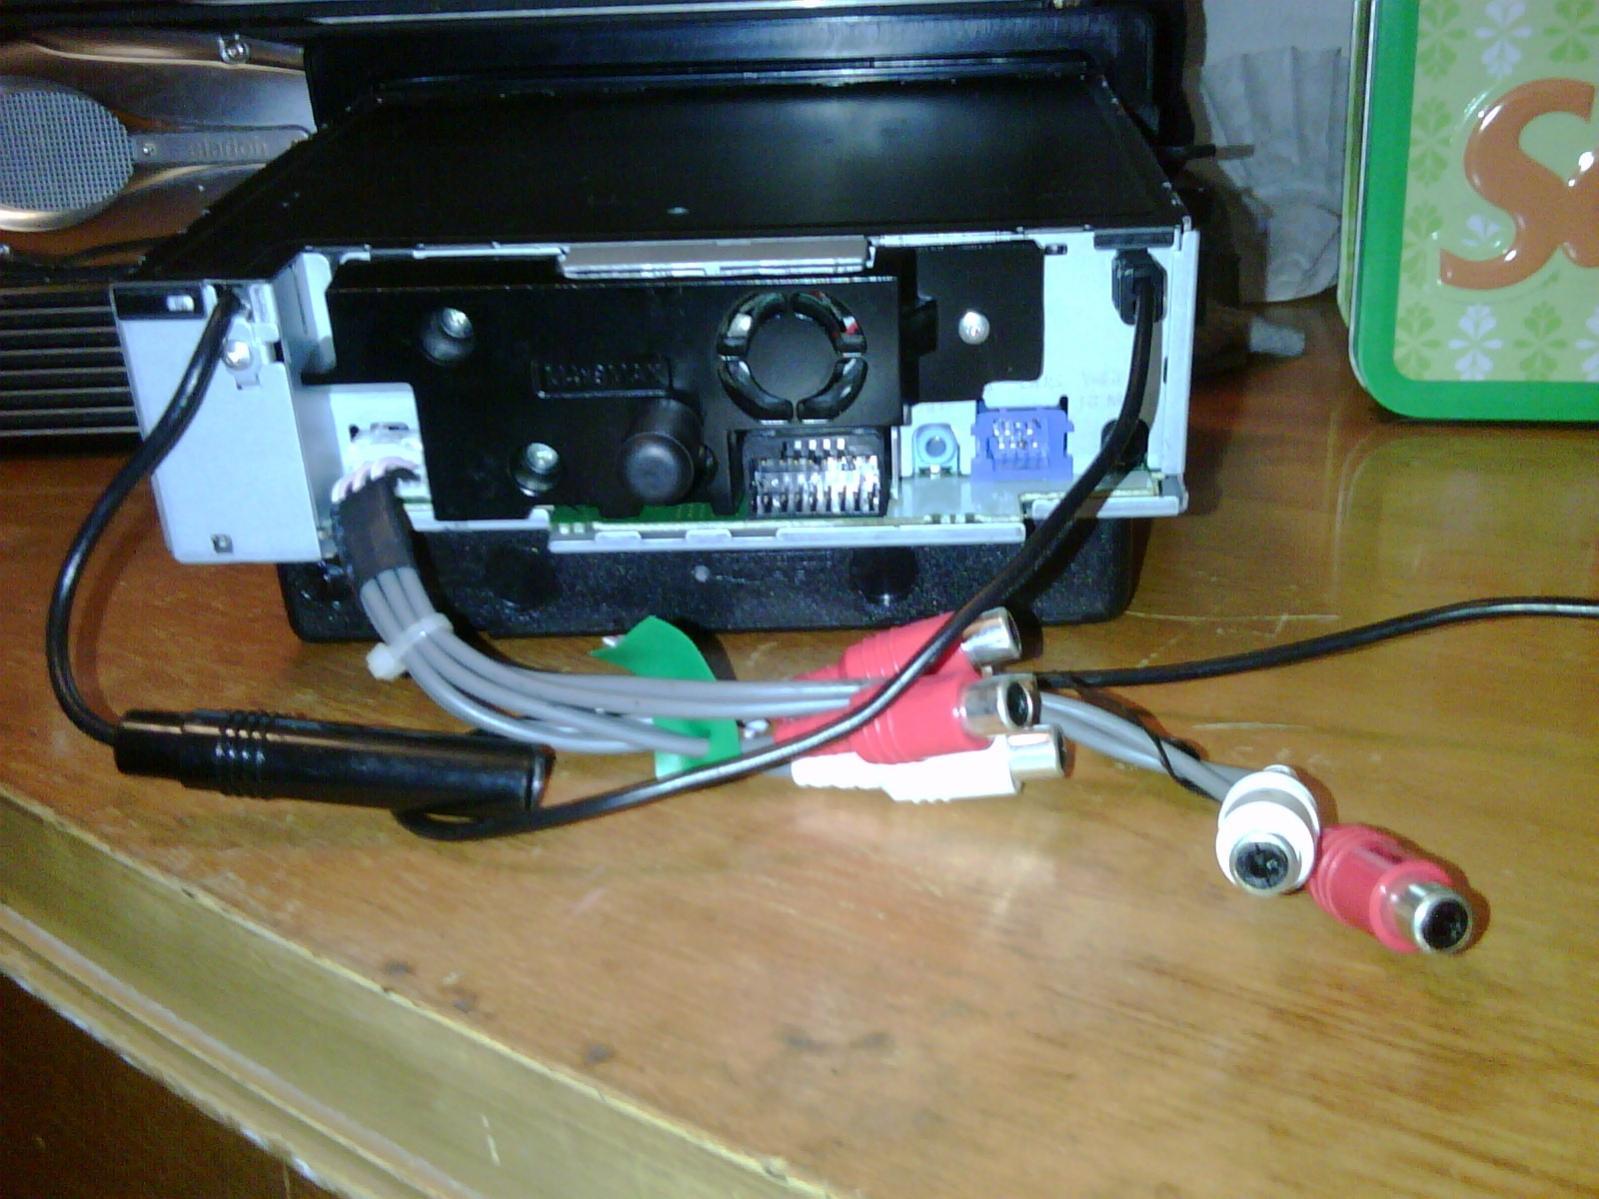 Car Audio Wiring Pioneer Deh P980bt Schematics Diagram Diagrams For Stereos X3599uf Premier Bluetooth 300 Nissan Titan Forum Automotive